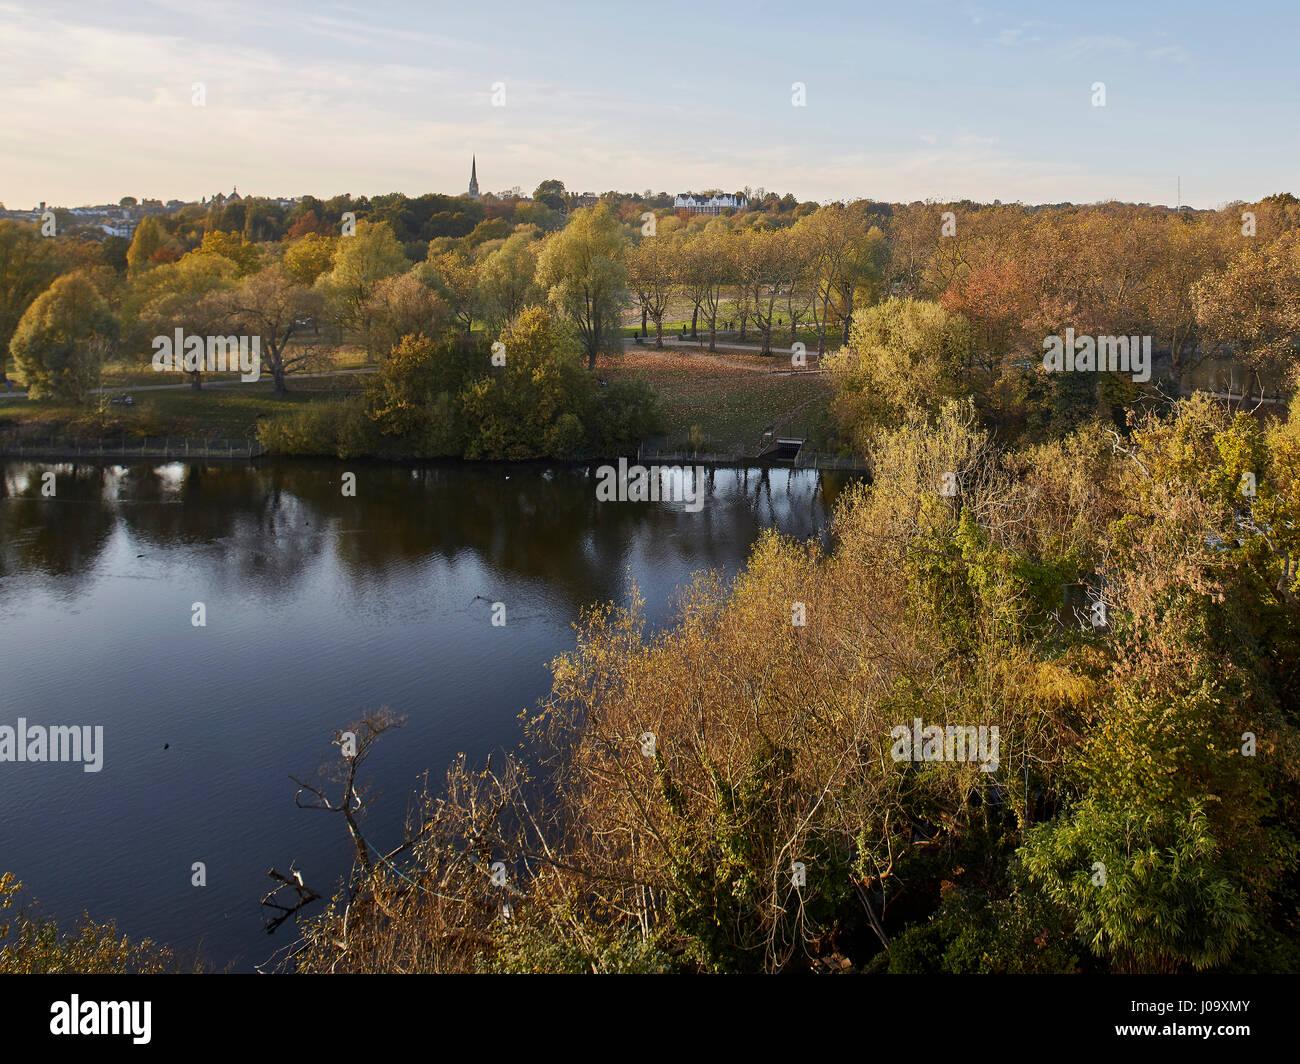 View. Hampstead Ponds House, London, United Kingdom. Architect: Stiff + Trevillion Architects, 2016. - Stock Image